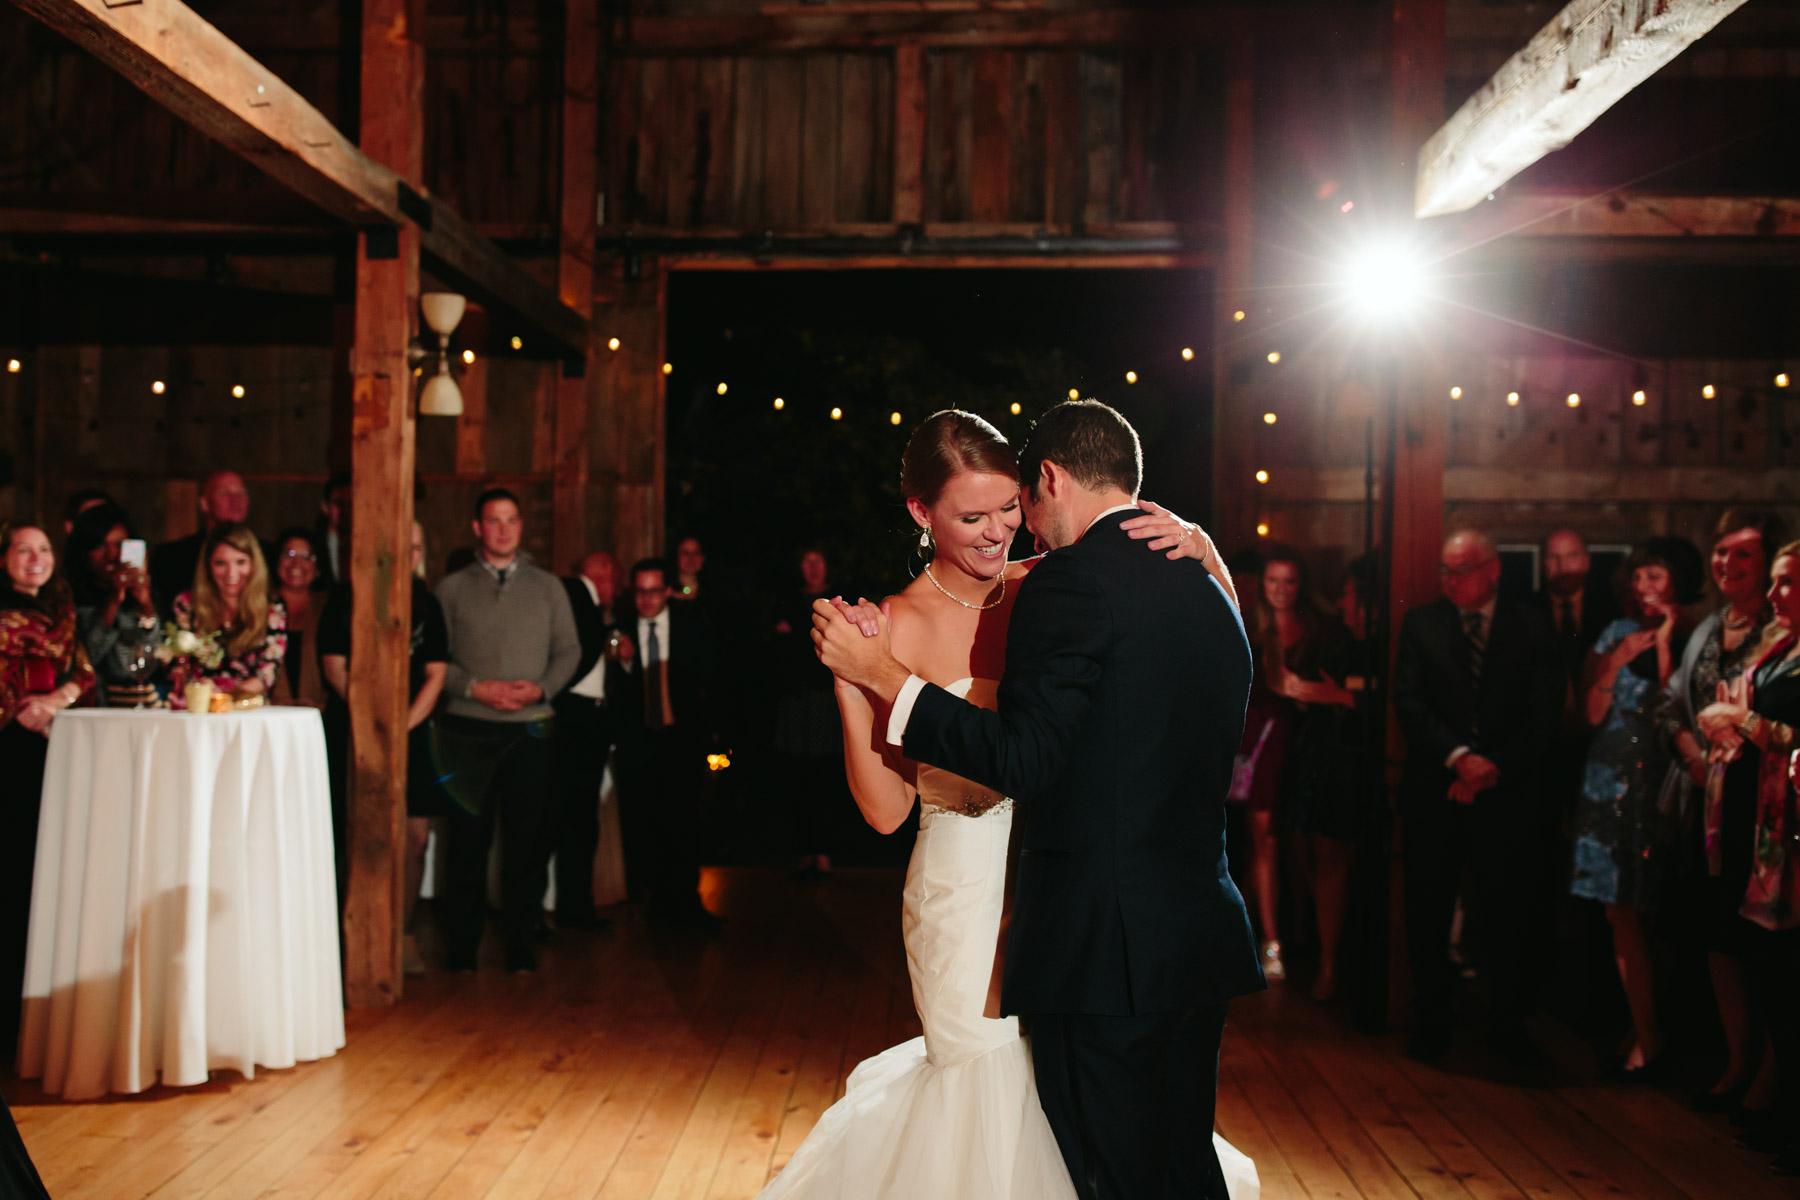 New England Wedding Photographer 49 Documentary Wedding Photographer Kerri Green